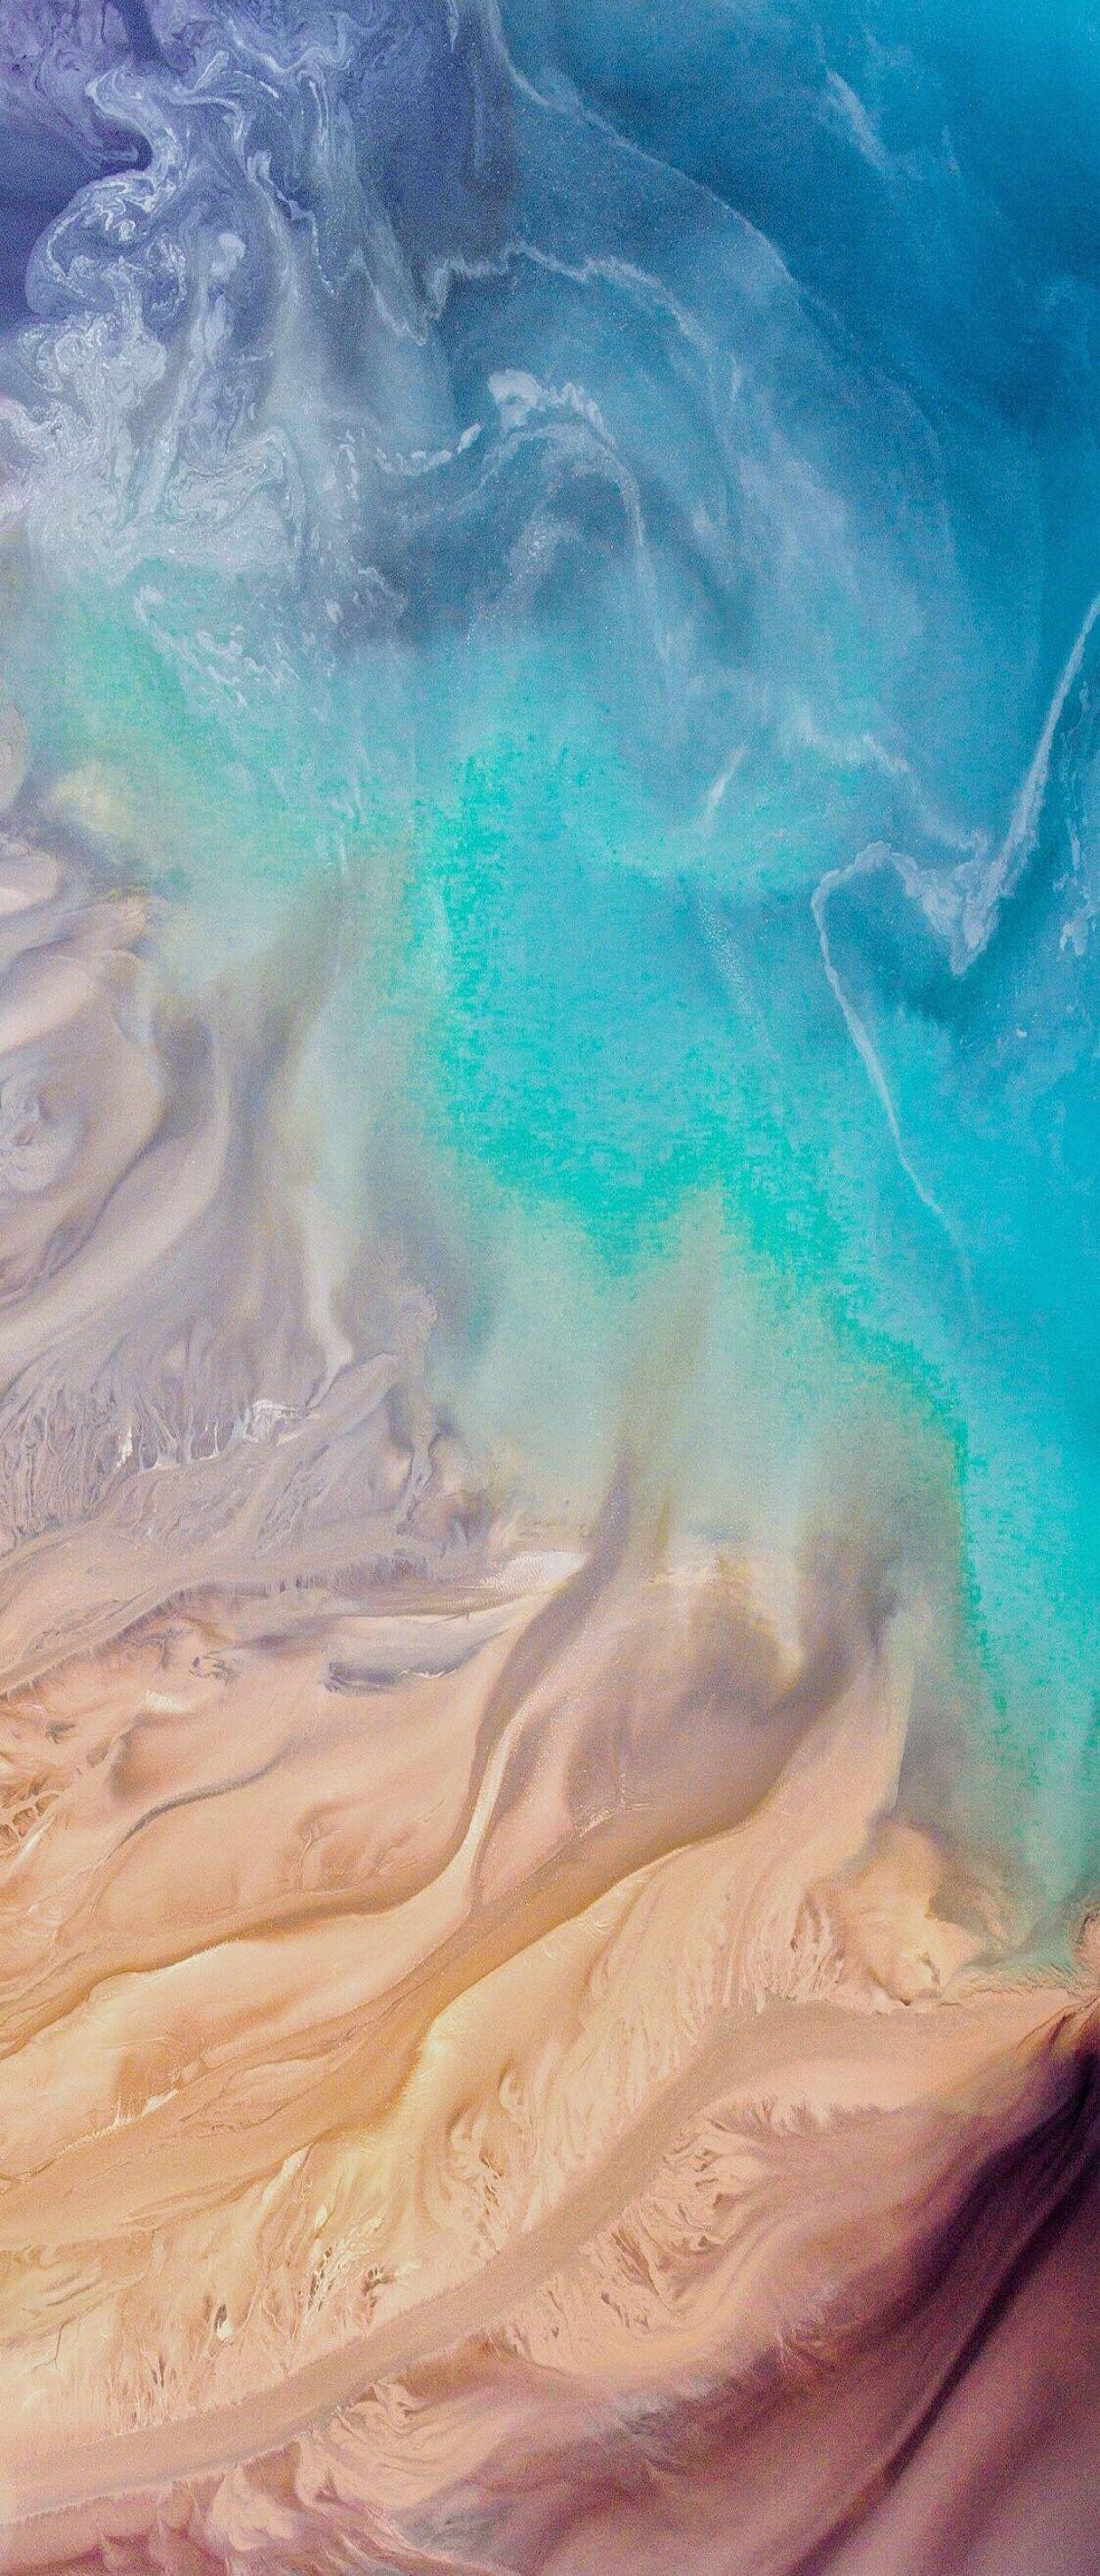 35 Aqua Blue iPhone Wallpapers   Download at WallpaperBro 1242x2908